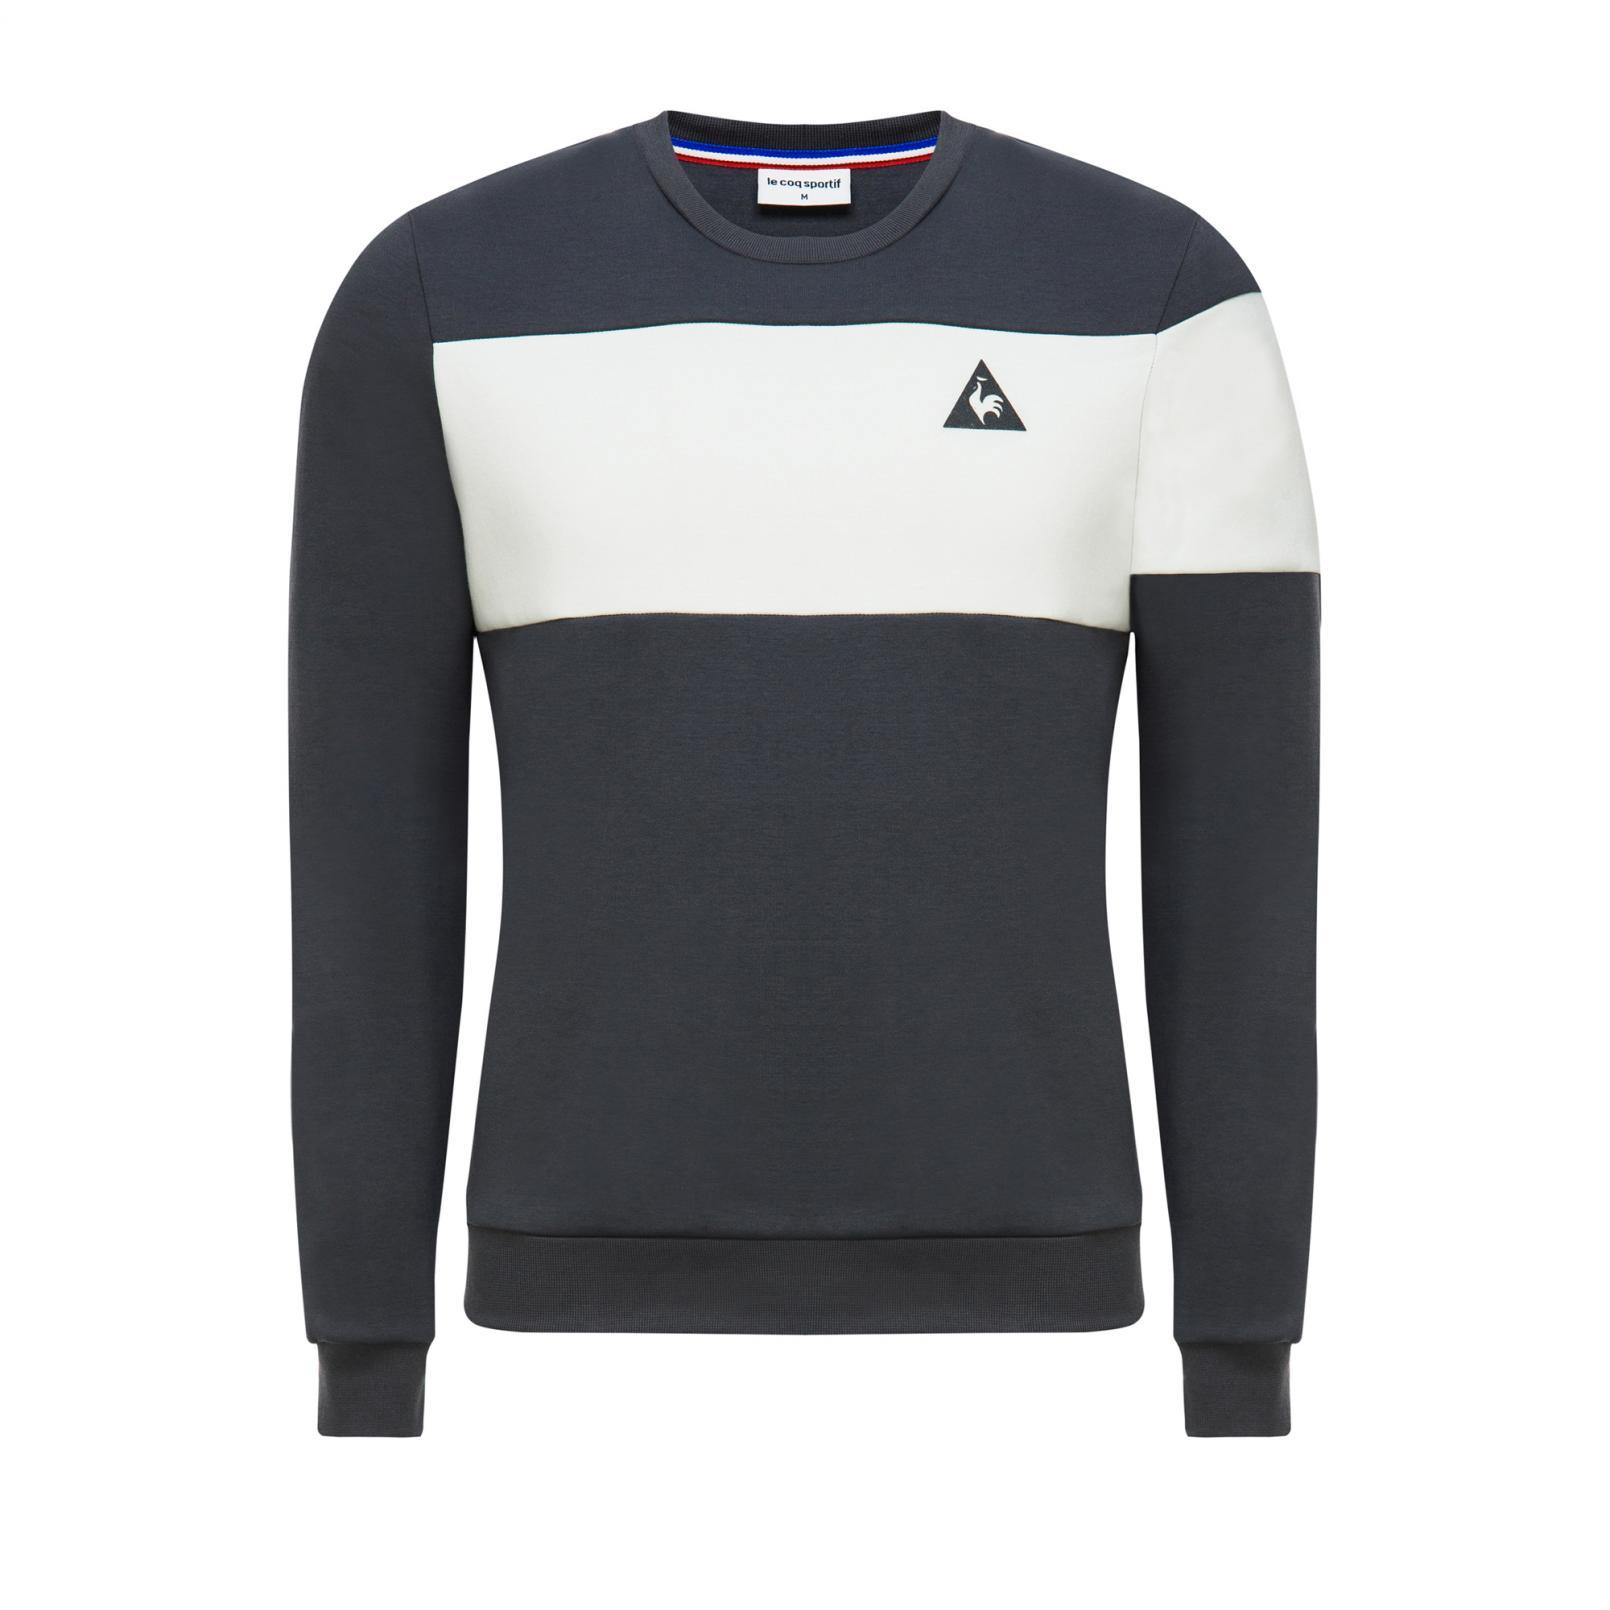 Sweat tops – Le Coq Sportif Crew Sweat Essentiels Grey/White